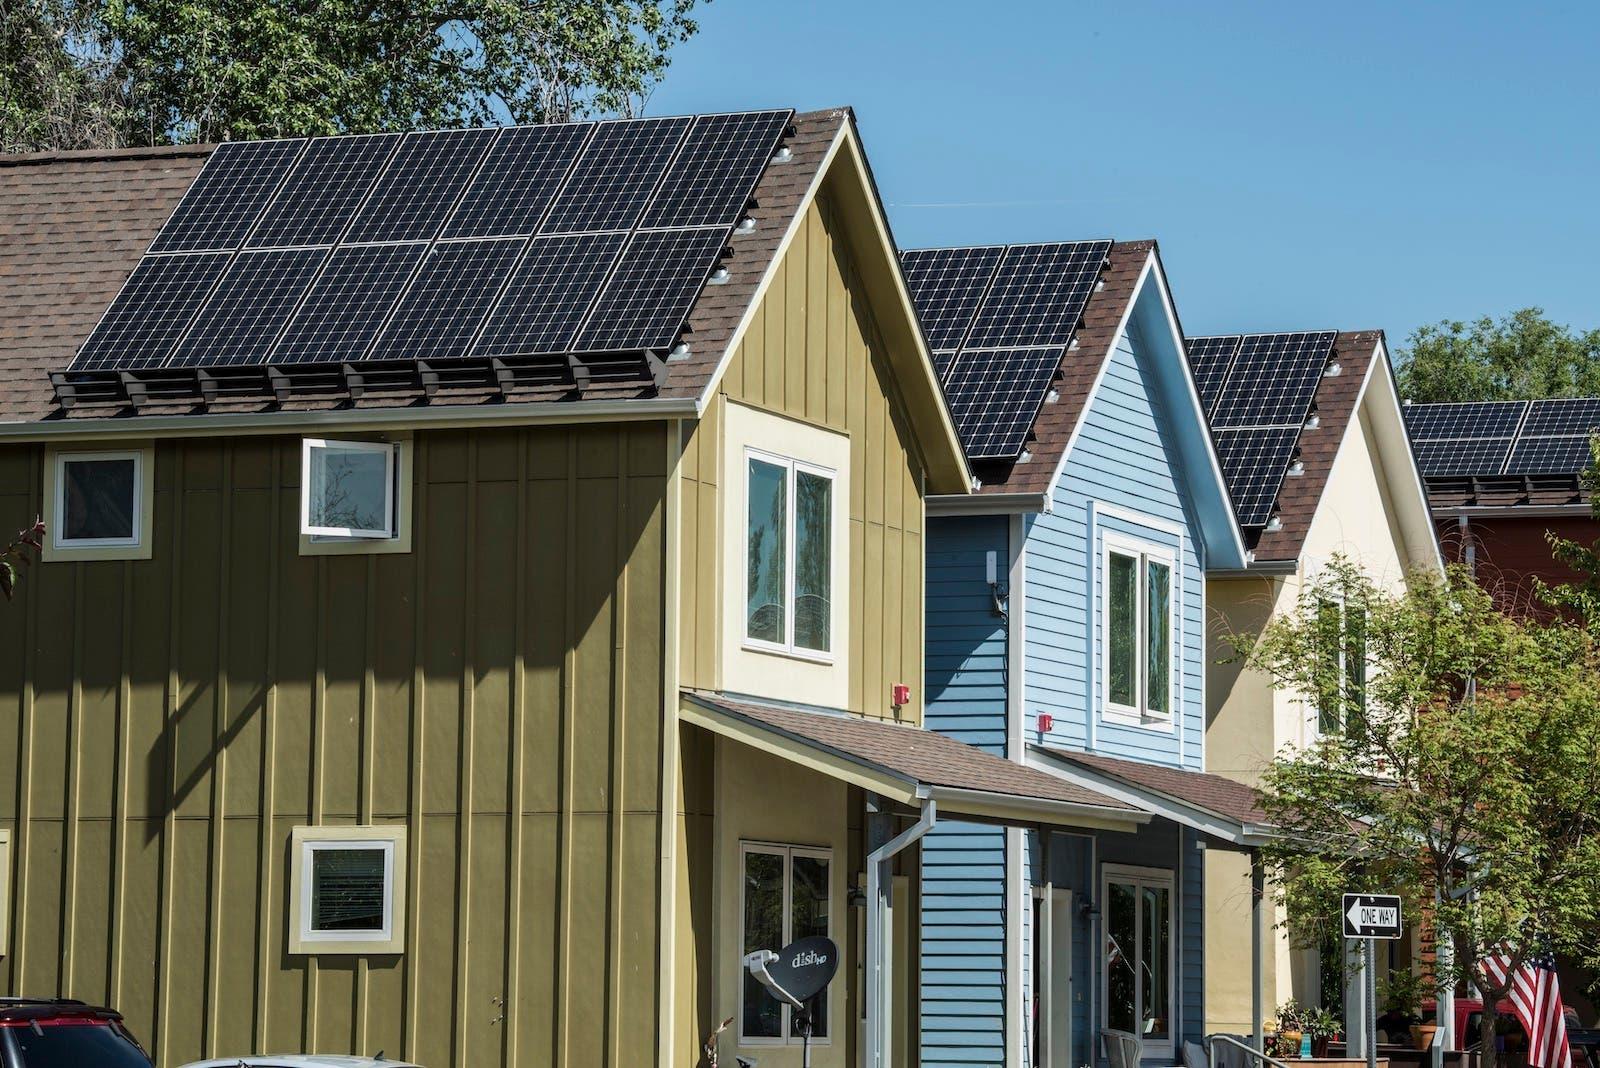 paneles solares en la azotea